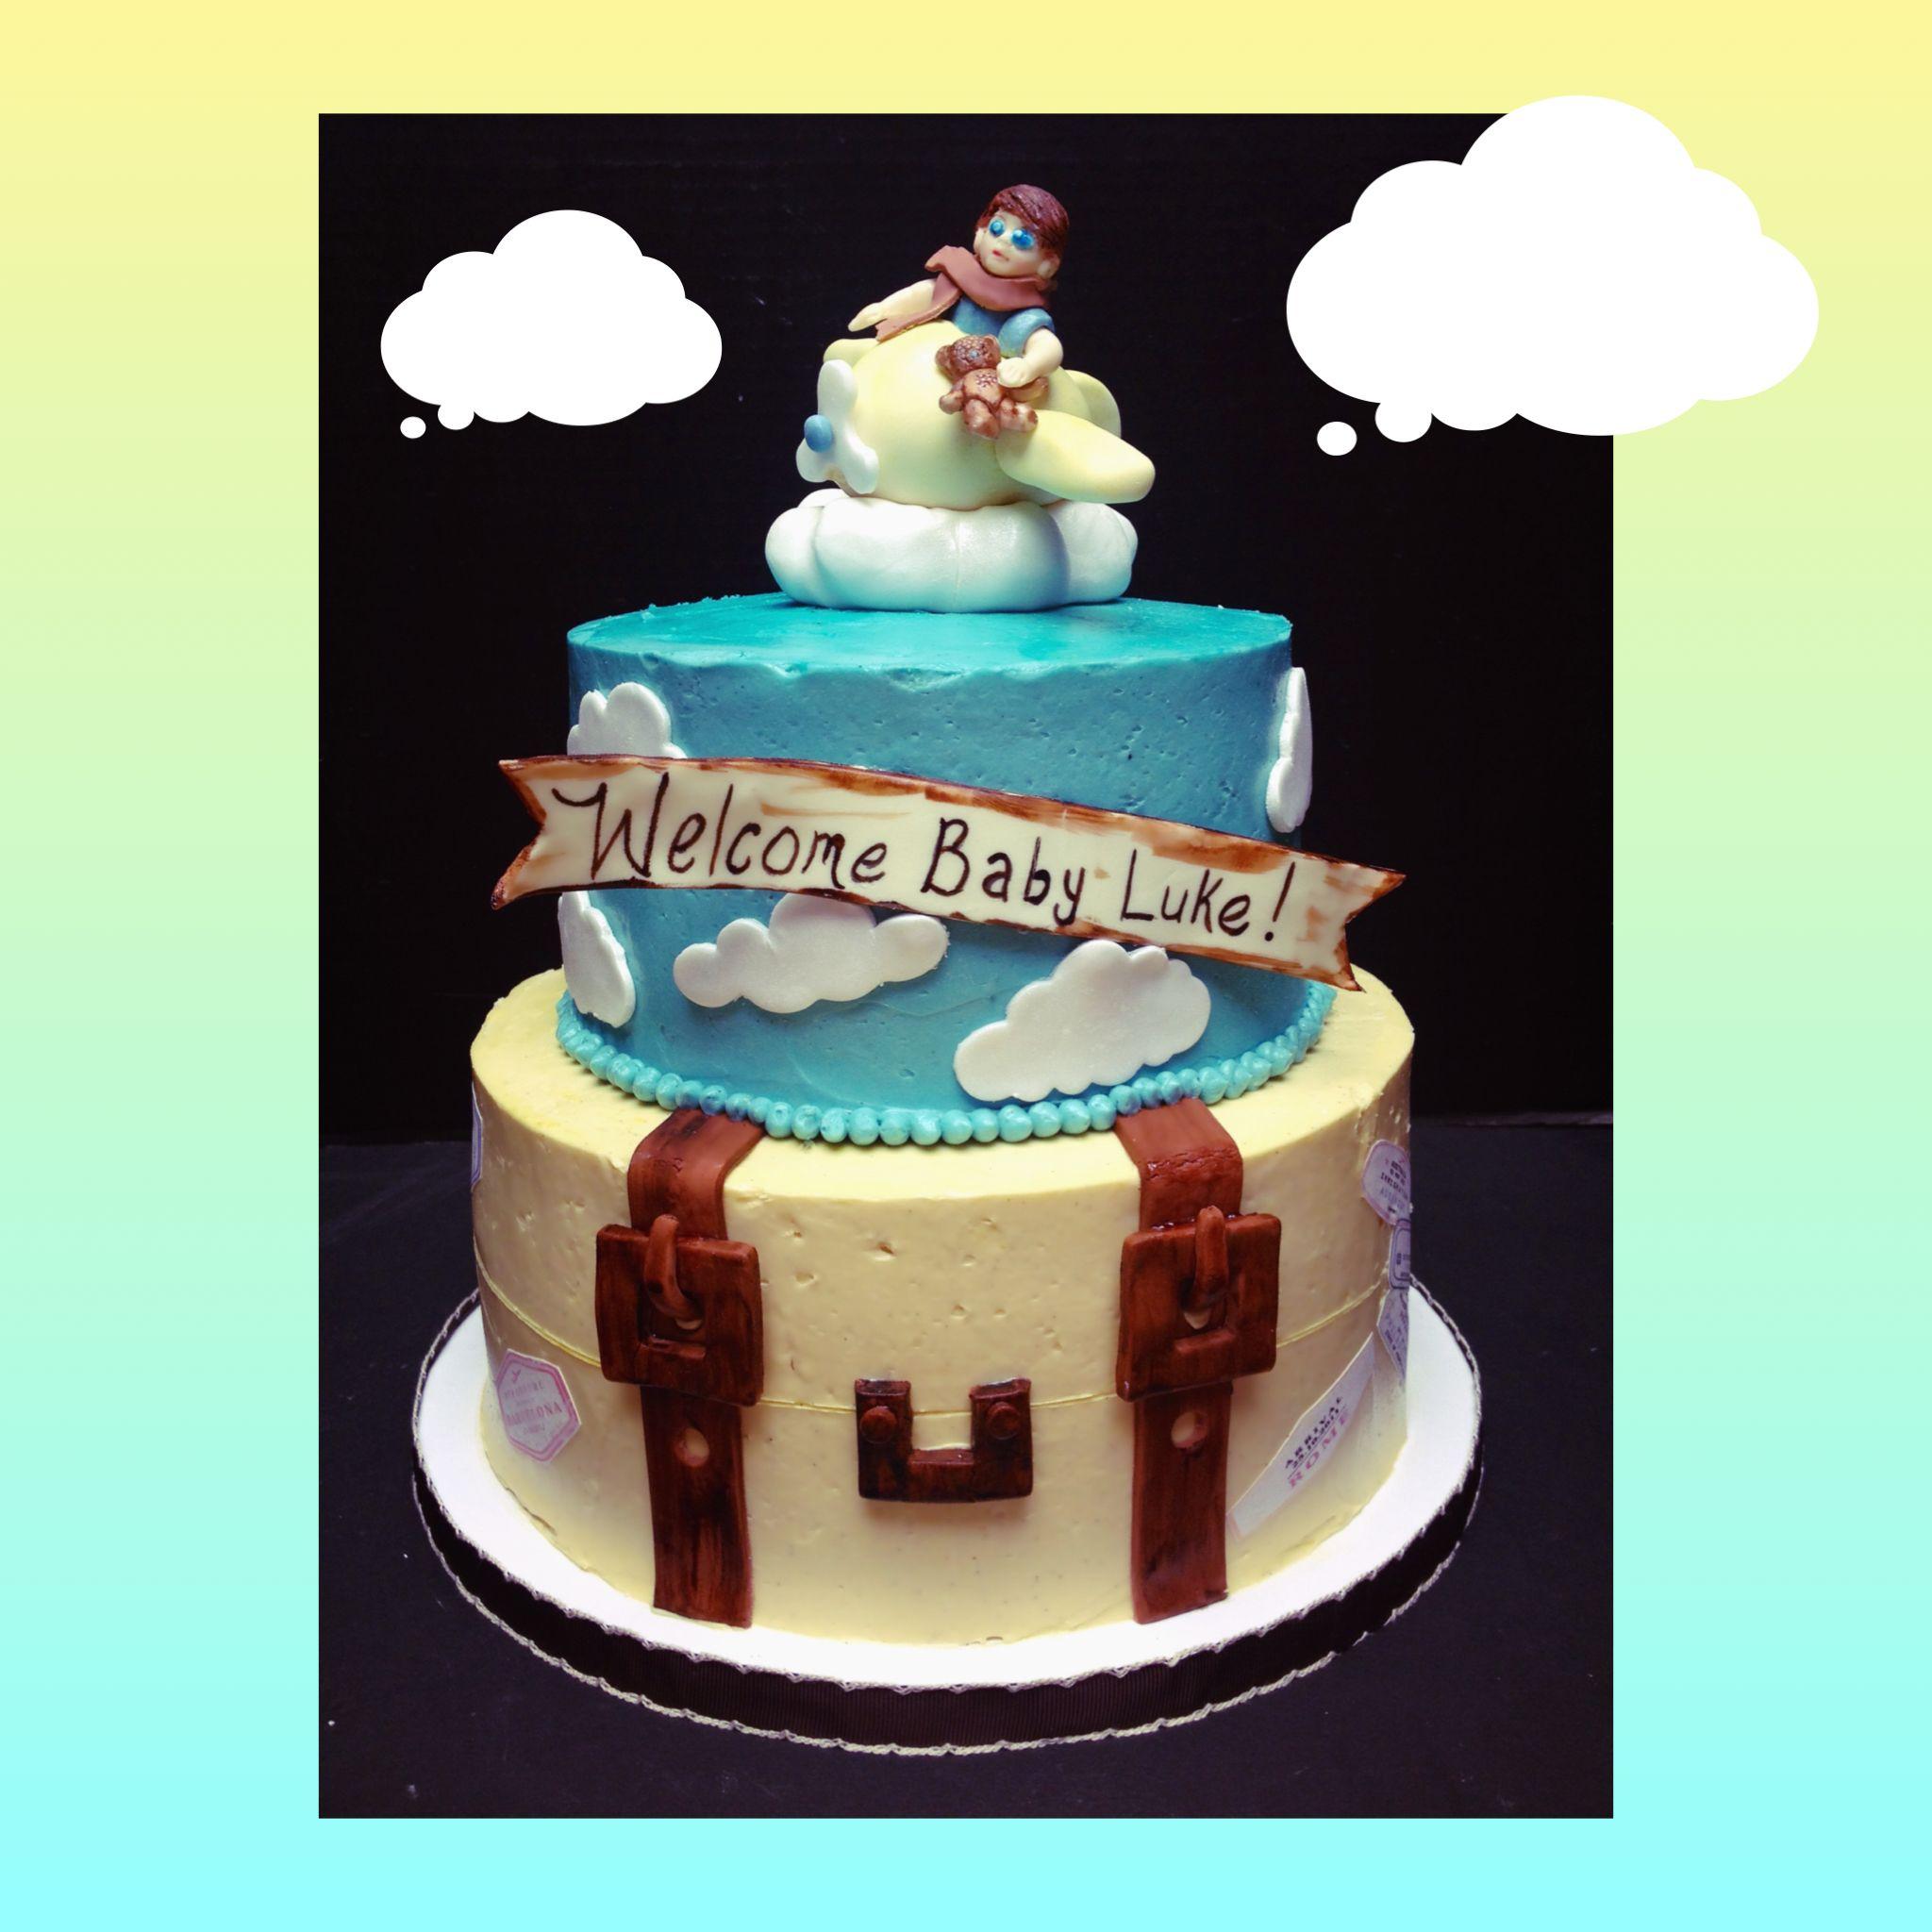 World travel suitcase baby shower cake White cake with vanilla